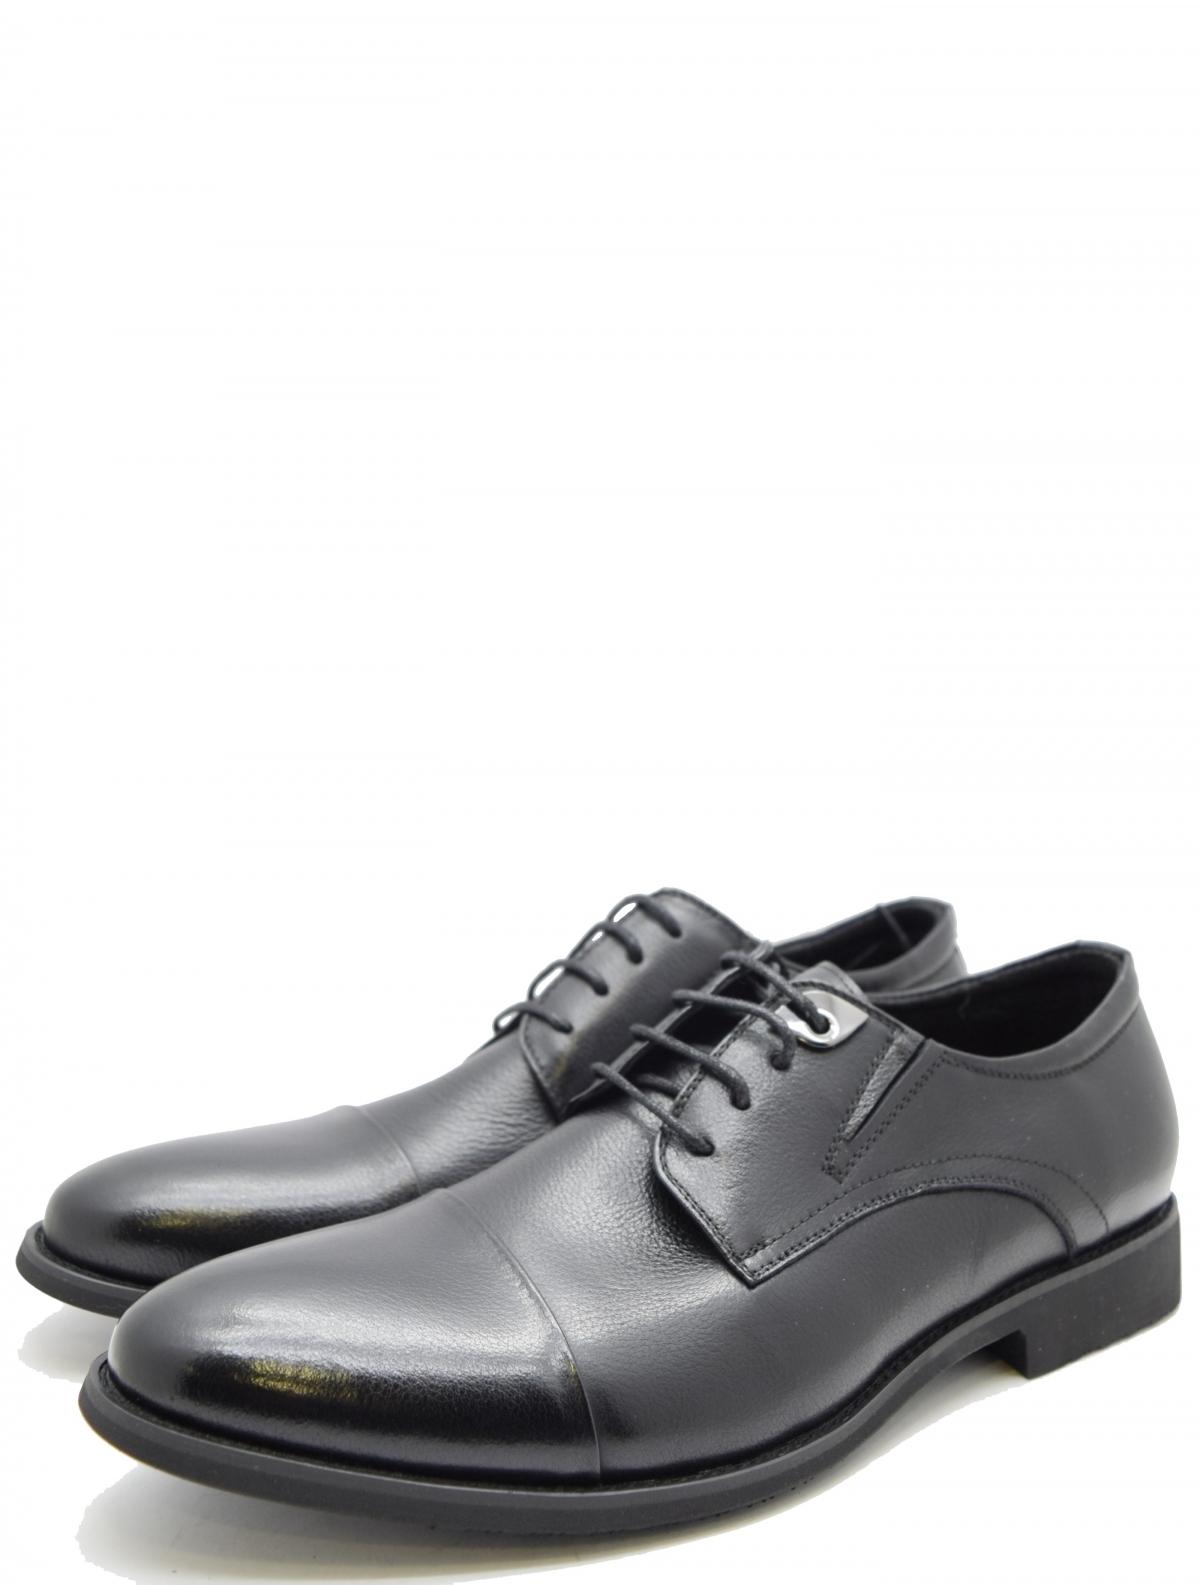 Baden R031-010 мужские туфли